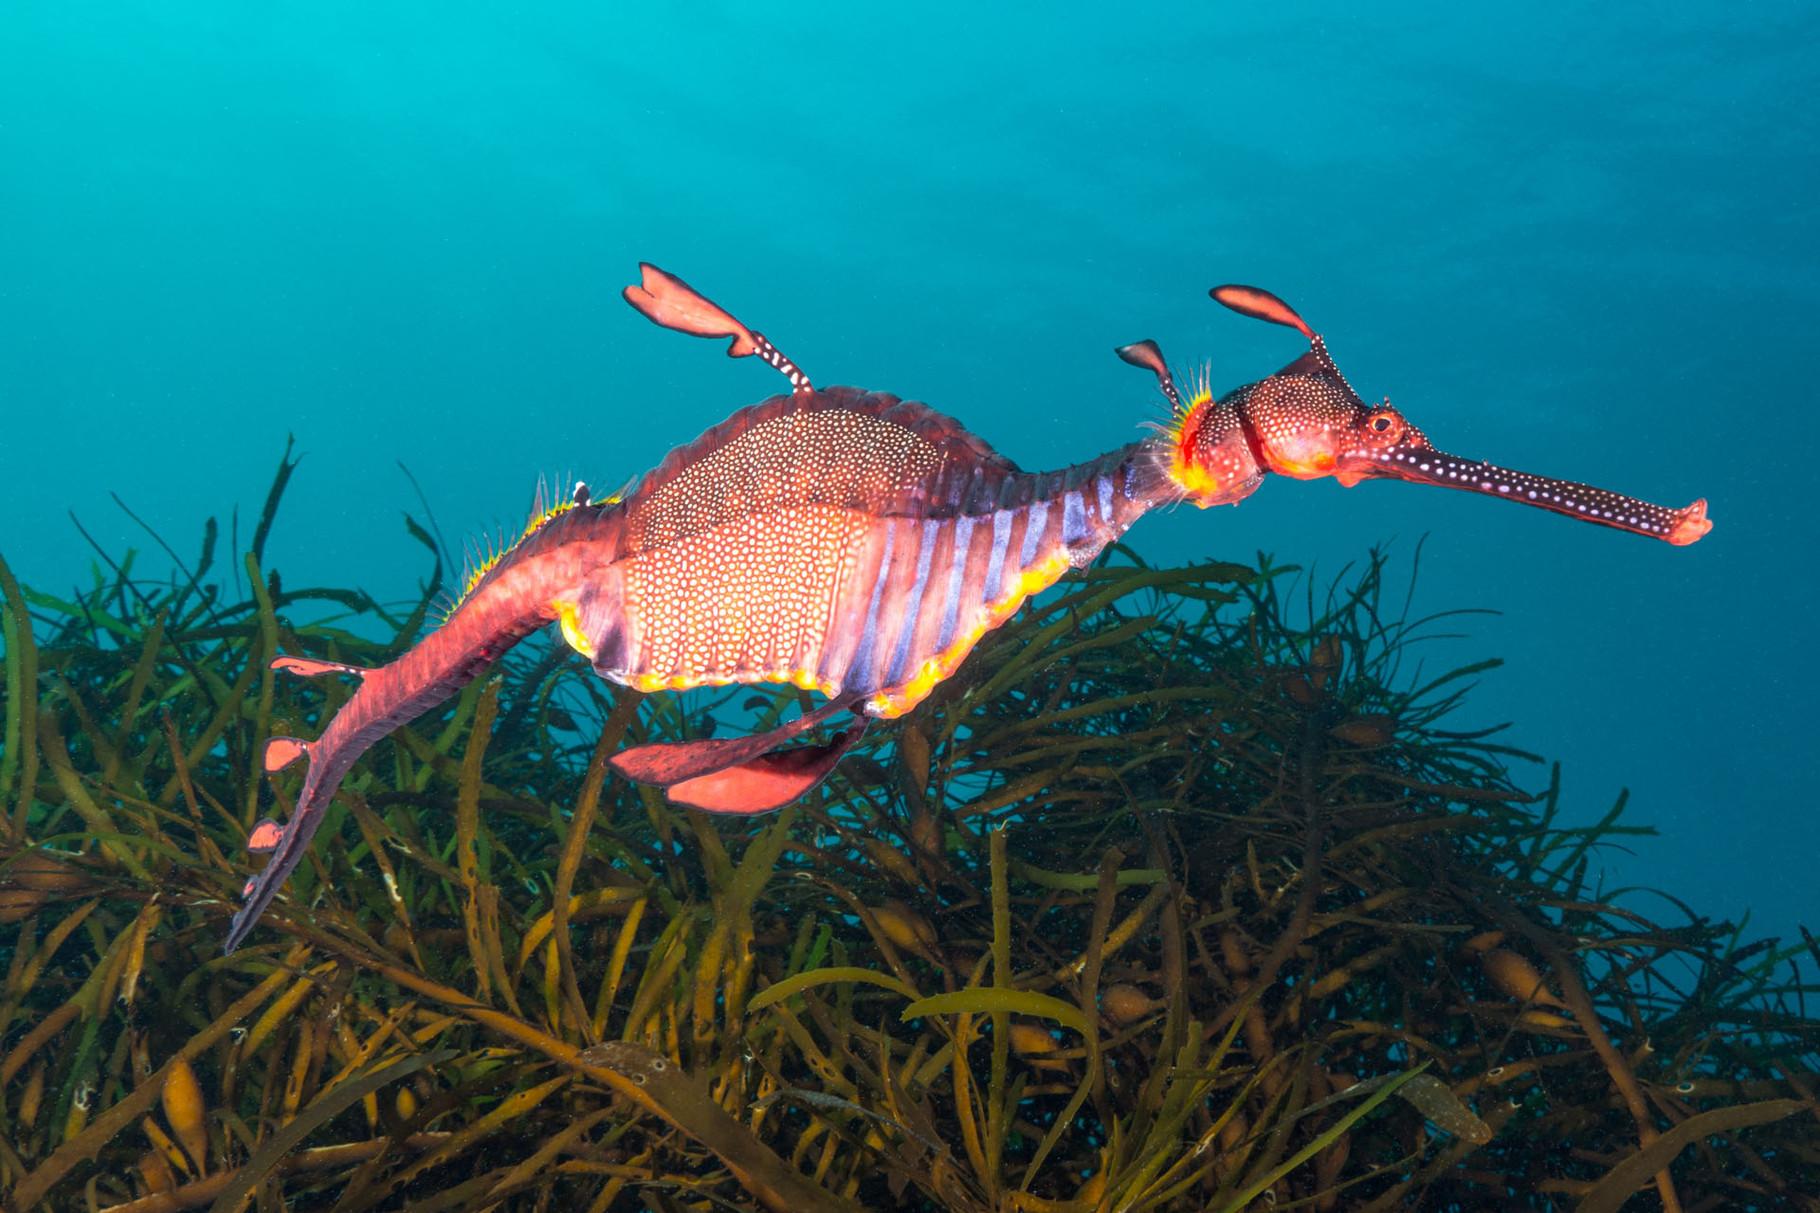 Weedy seadragon, Tasmania [Australia, 2014]